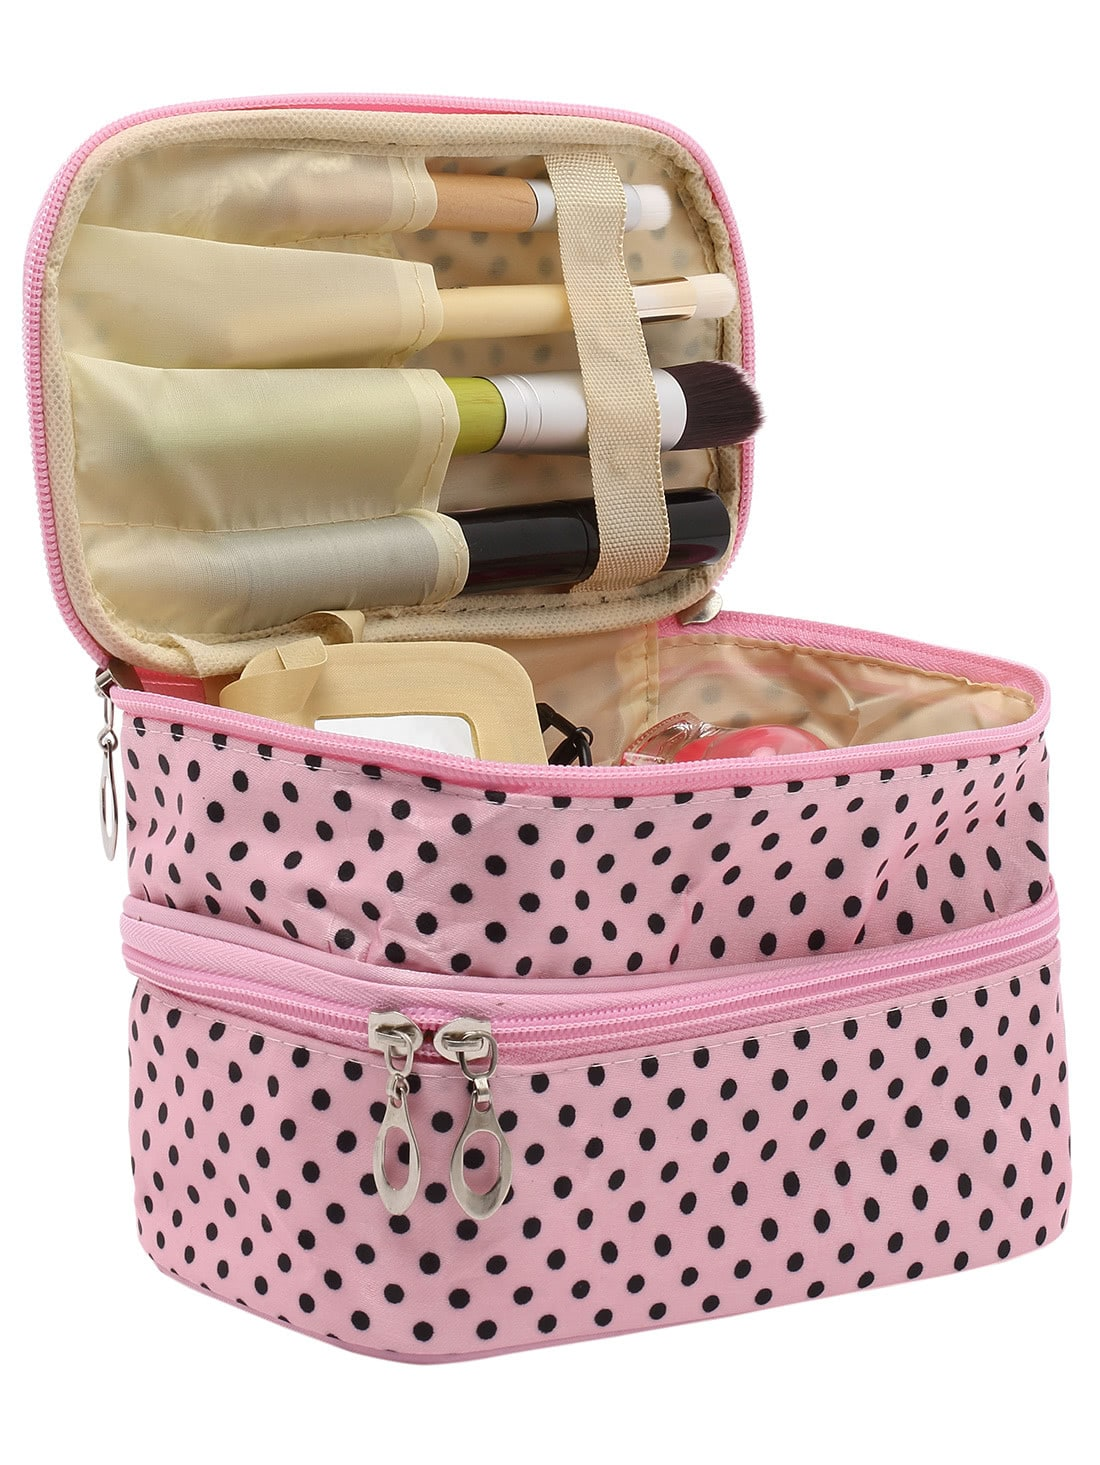 Pink Polka Dot Double Layers Cosmetic Bag transer jasmine polka dot flip double zipper cosmetic bag 0213 drop shipping